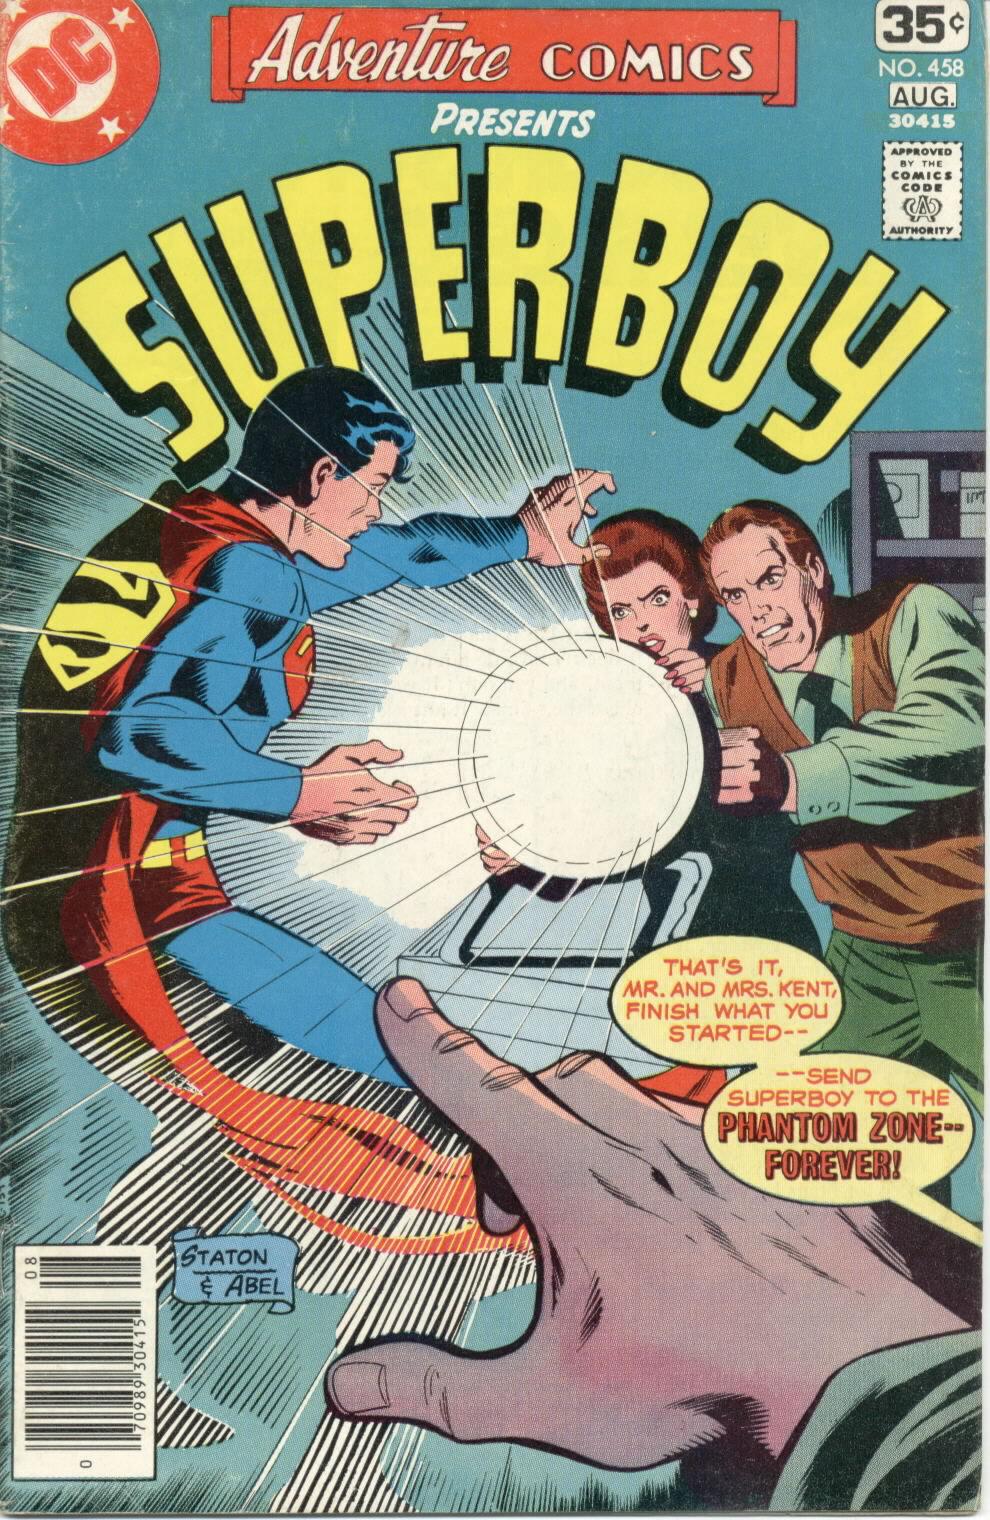 Read online Adventure Comics (1938) comic -  Issue #458 - 1